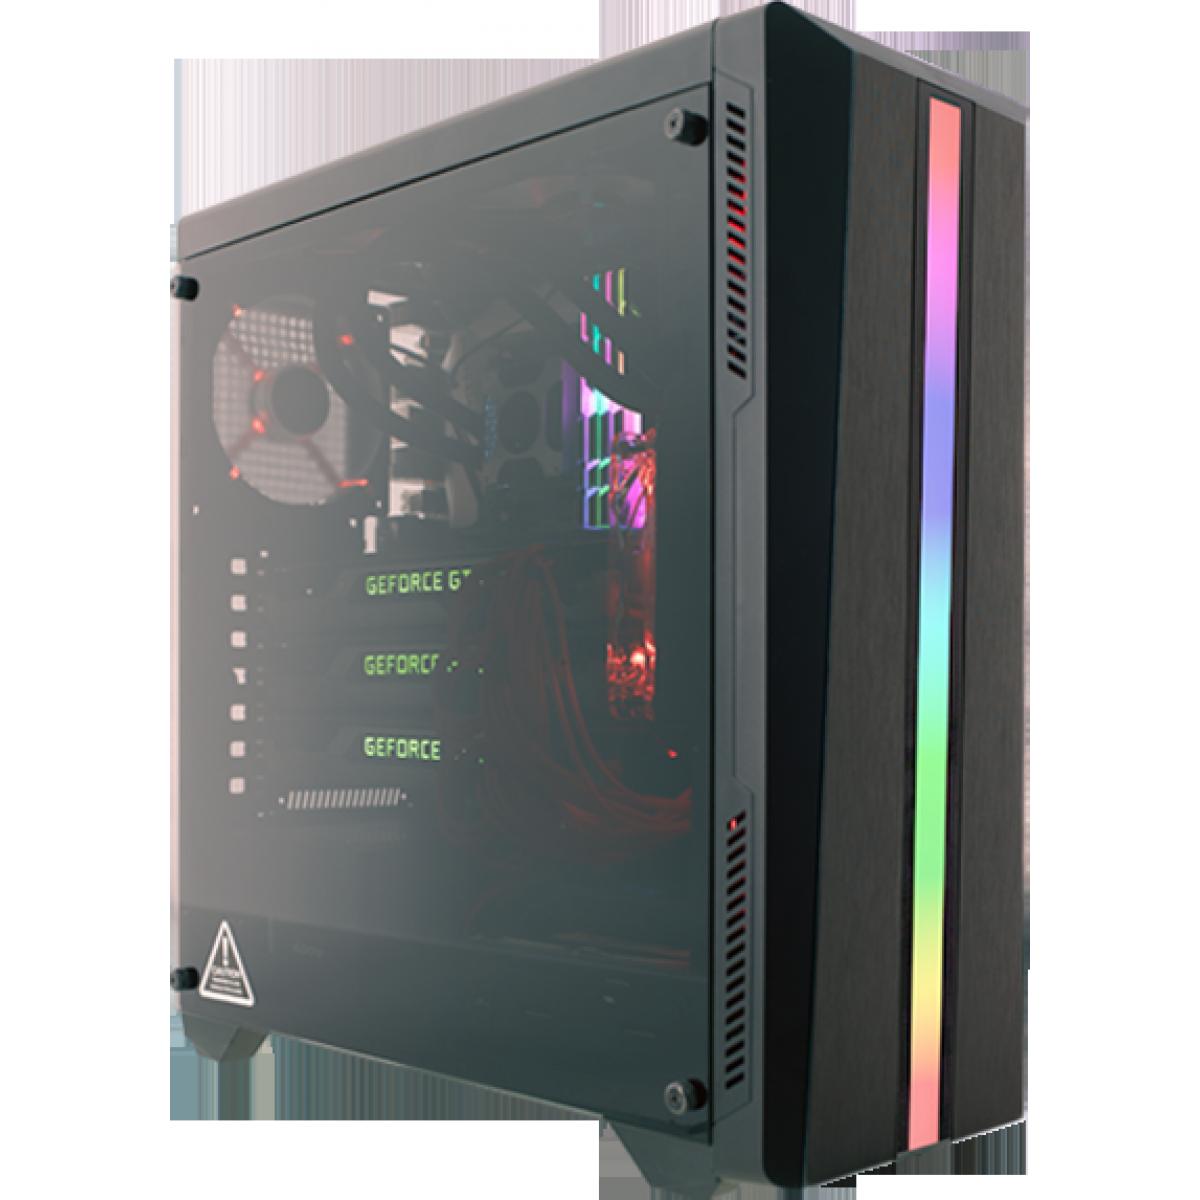 Pc Gamer T-Power Colonel Lvl-2 AMD Ryzen 7 2700 / GeForce GTX 1660 Ti / DDR4 8GB / HD 1TB / 600W